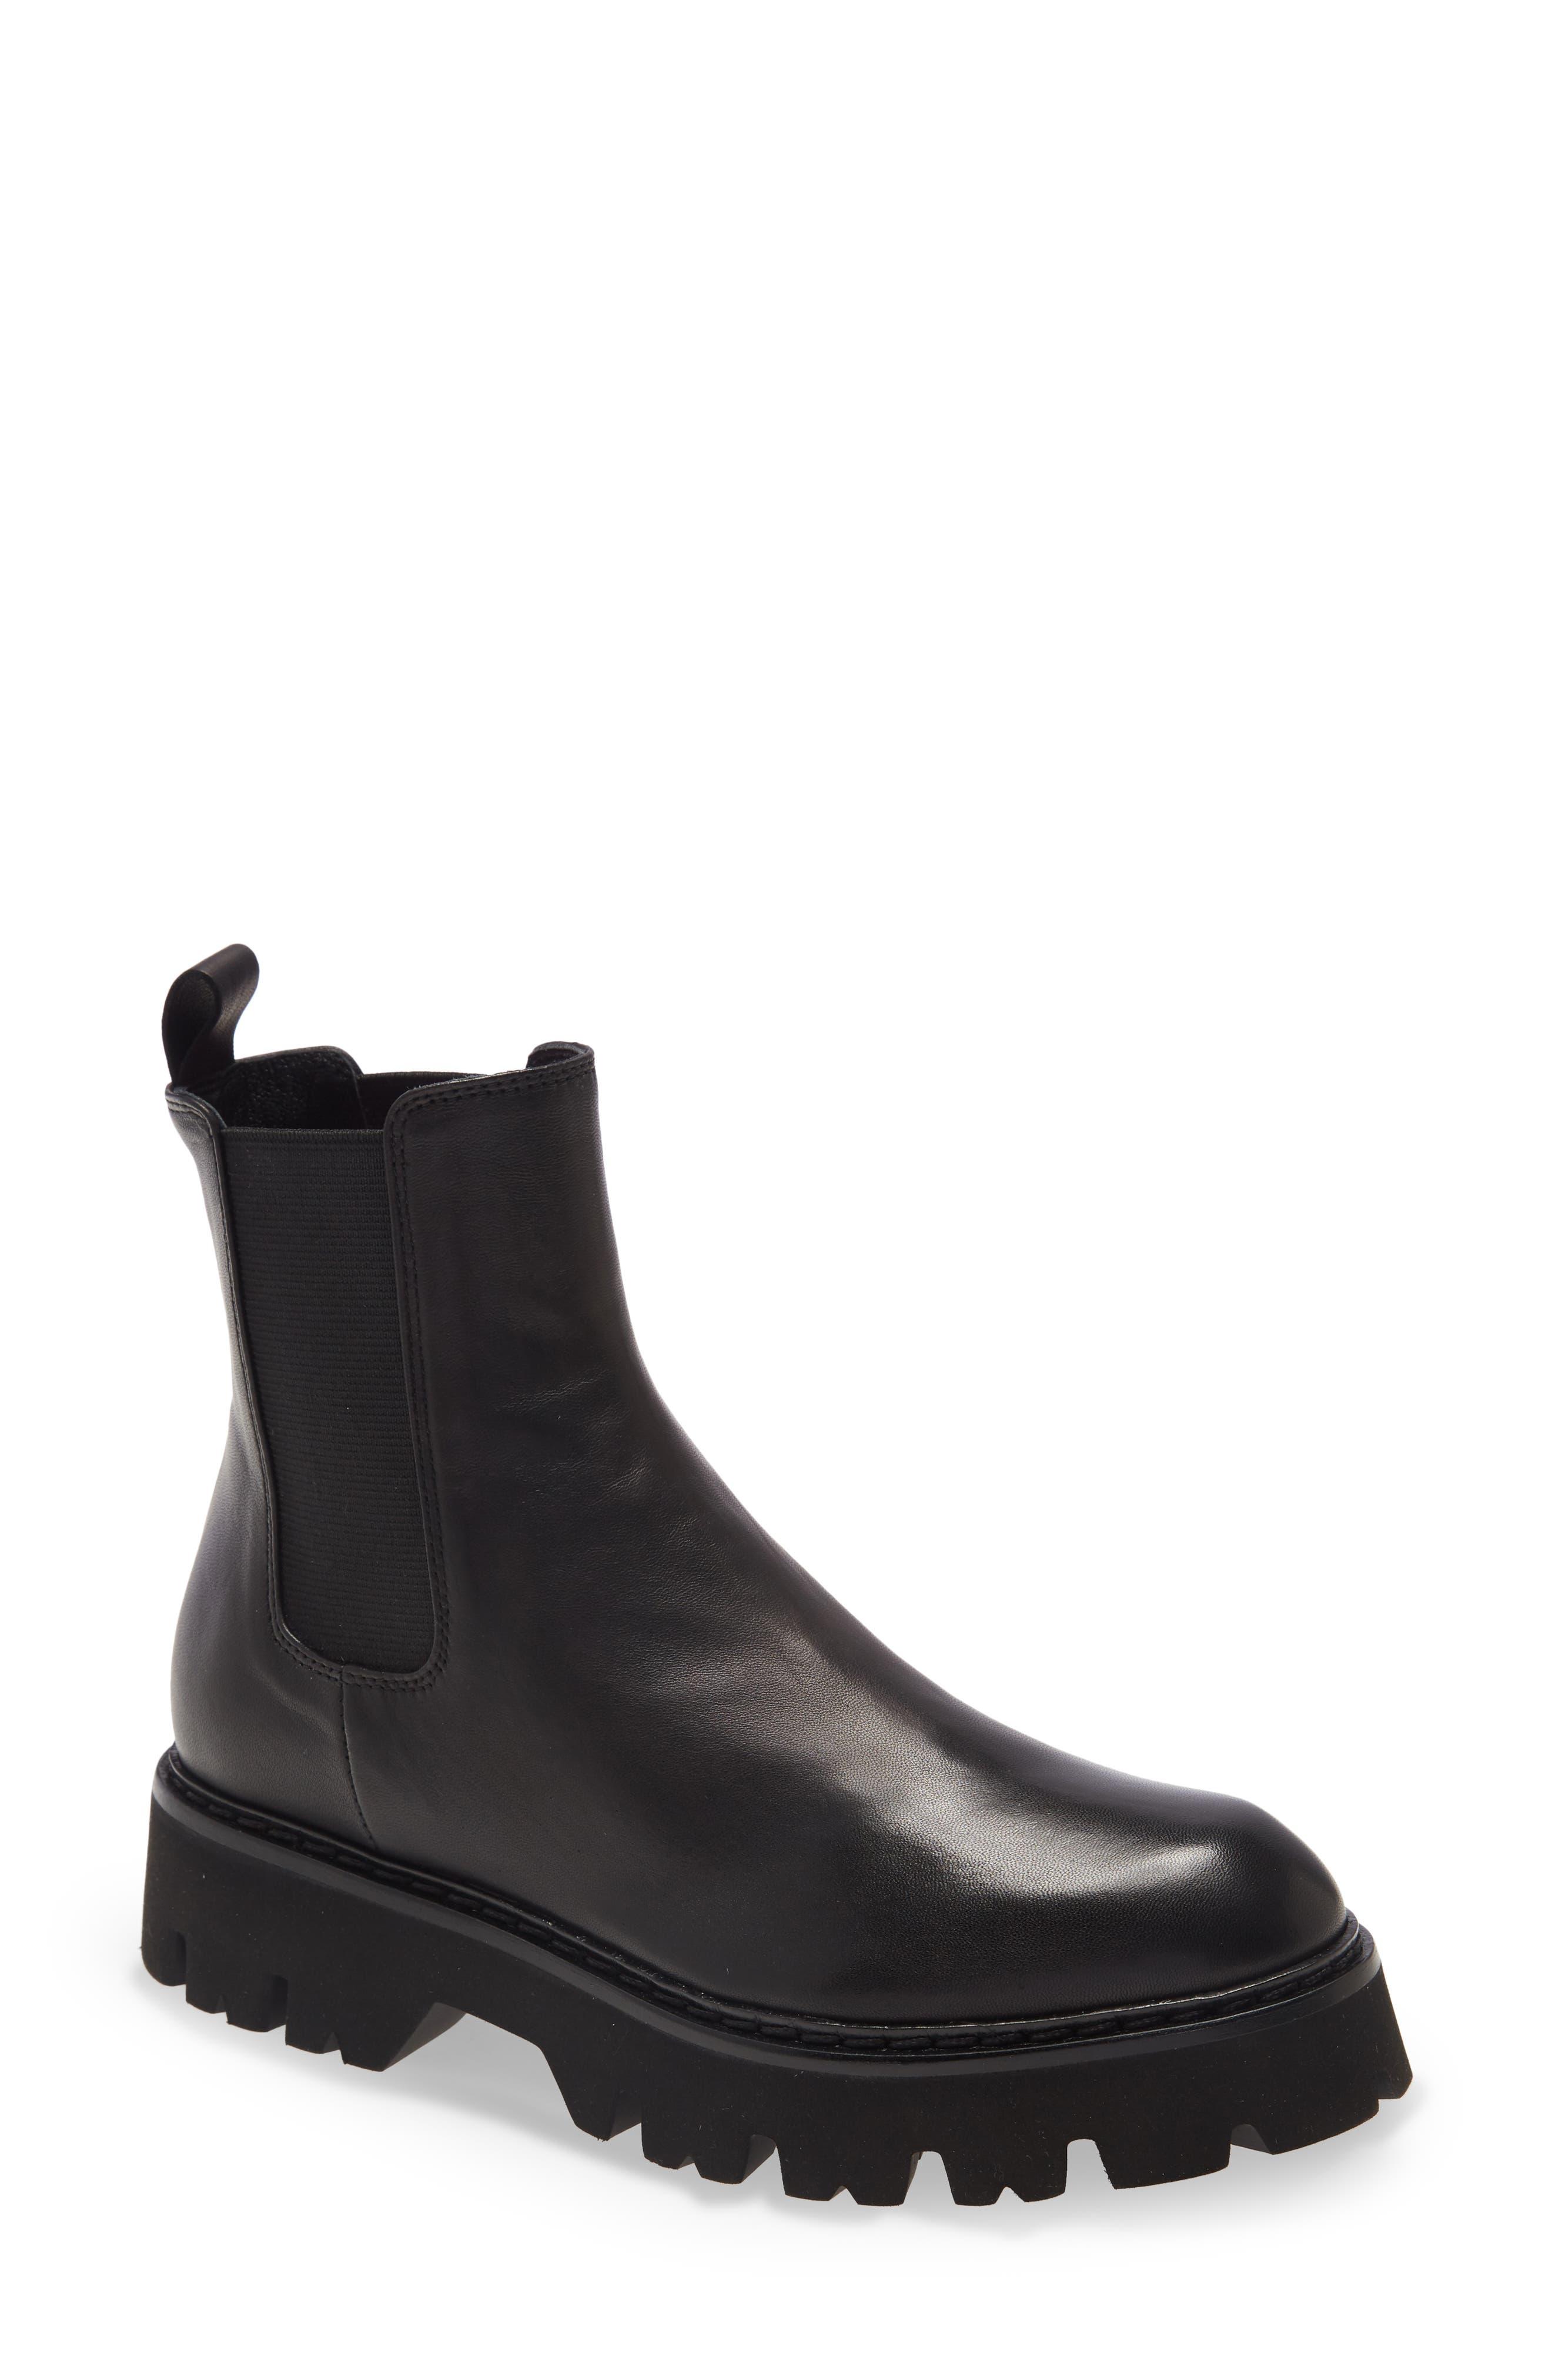 Xo Microlight Chelsea Boot